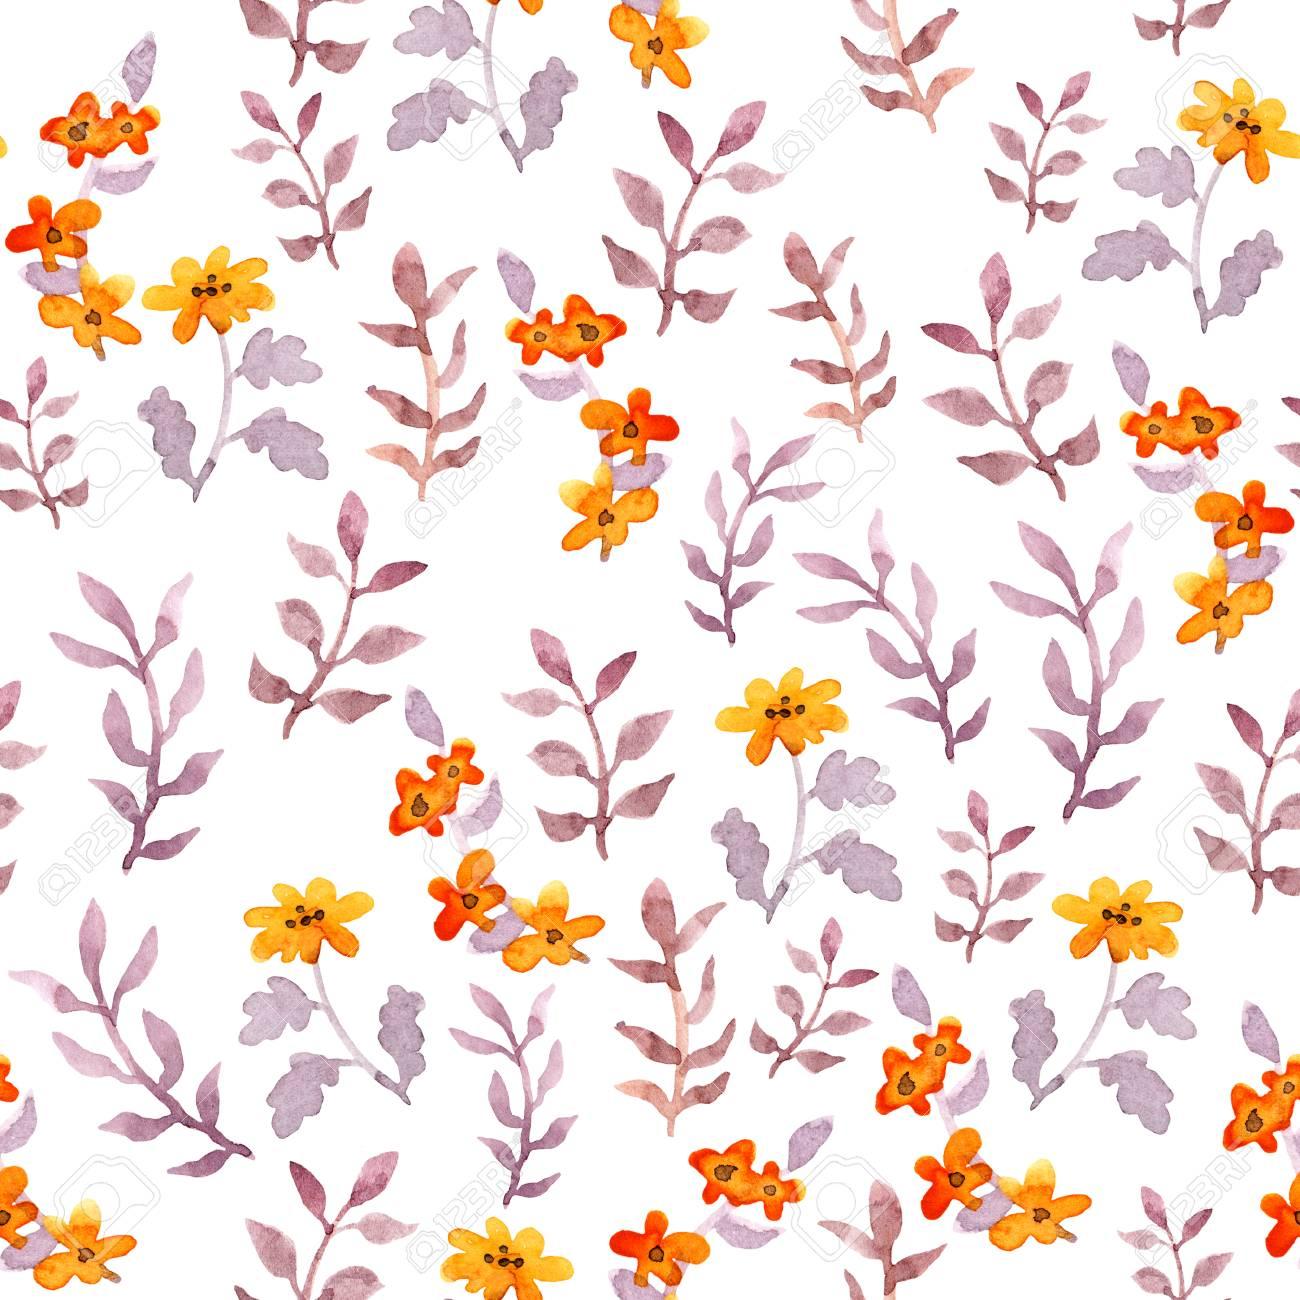 Seamless Simple Floral Pattern Vintage Cute Flowers And Leaves